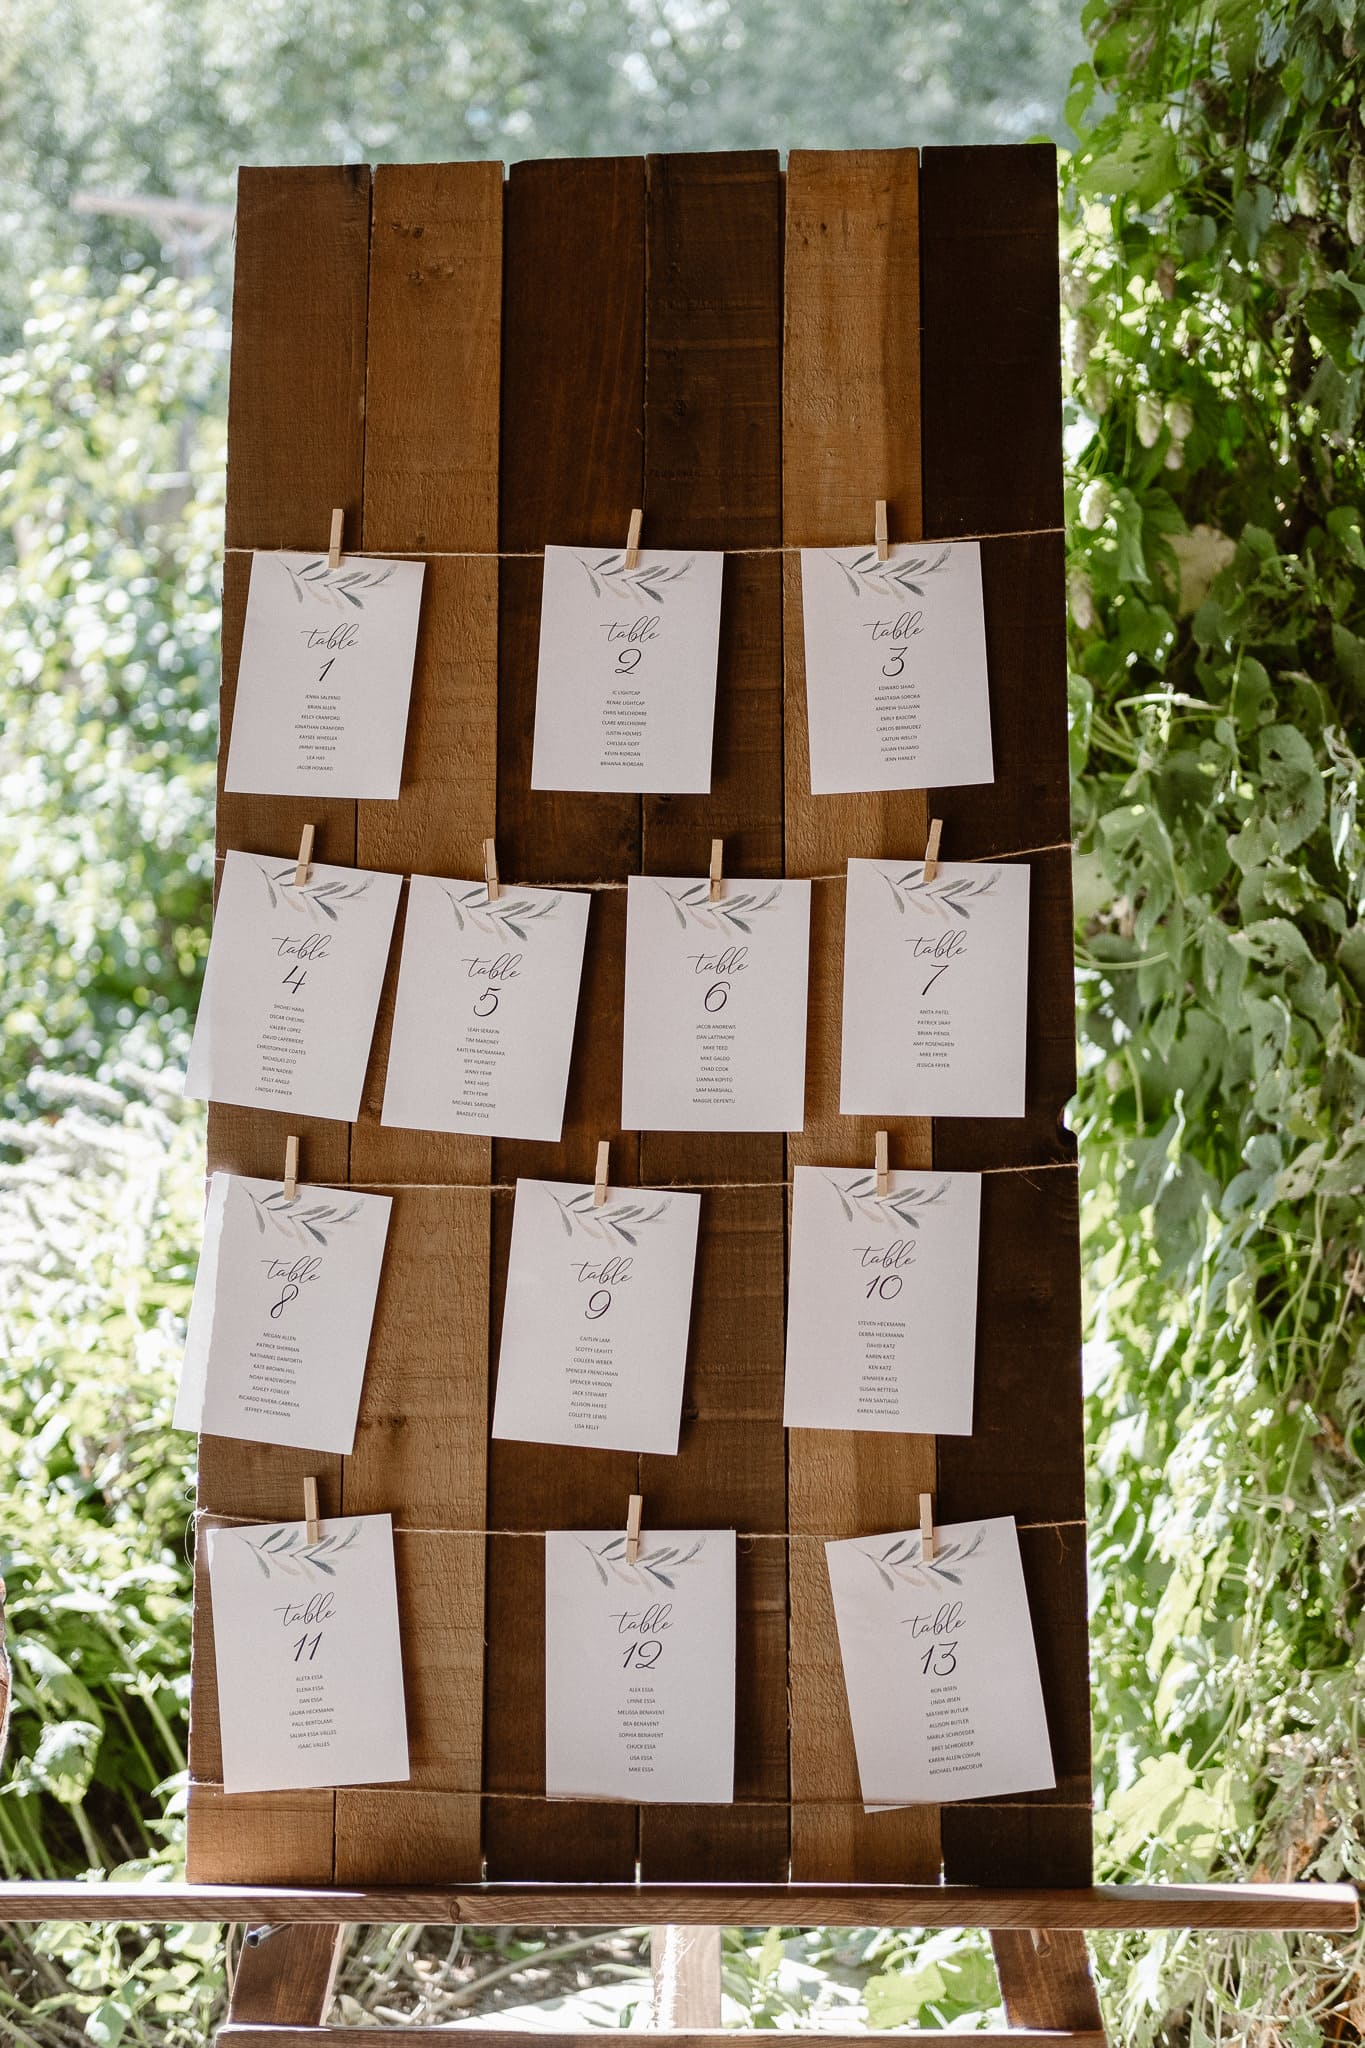 Lyons Farmette wedding photographer, Colorado intimate wedding photographer, table cards, place cards